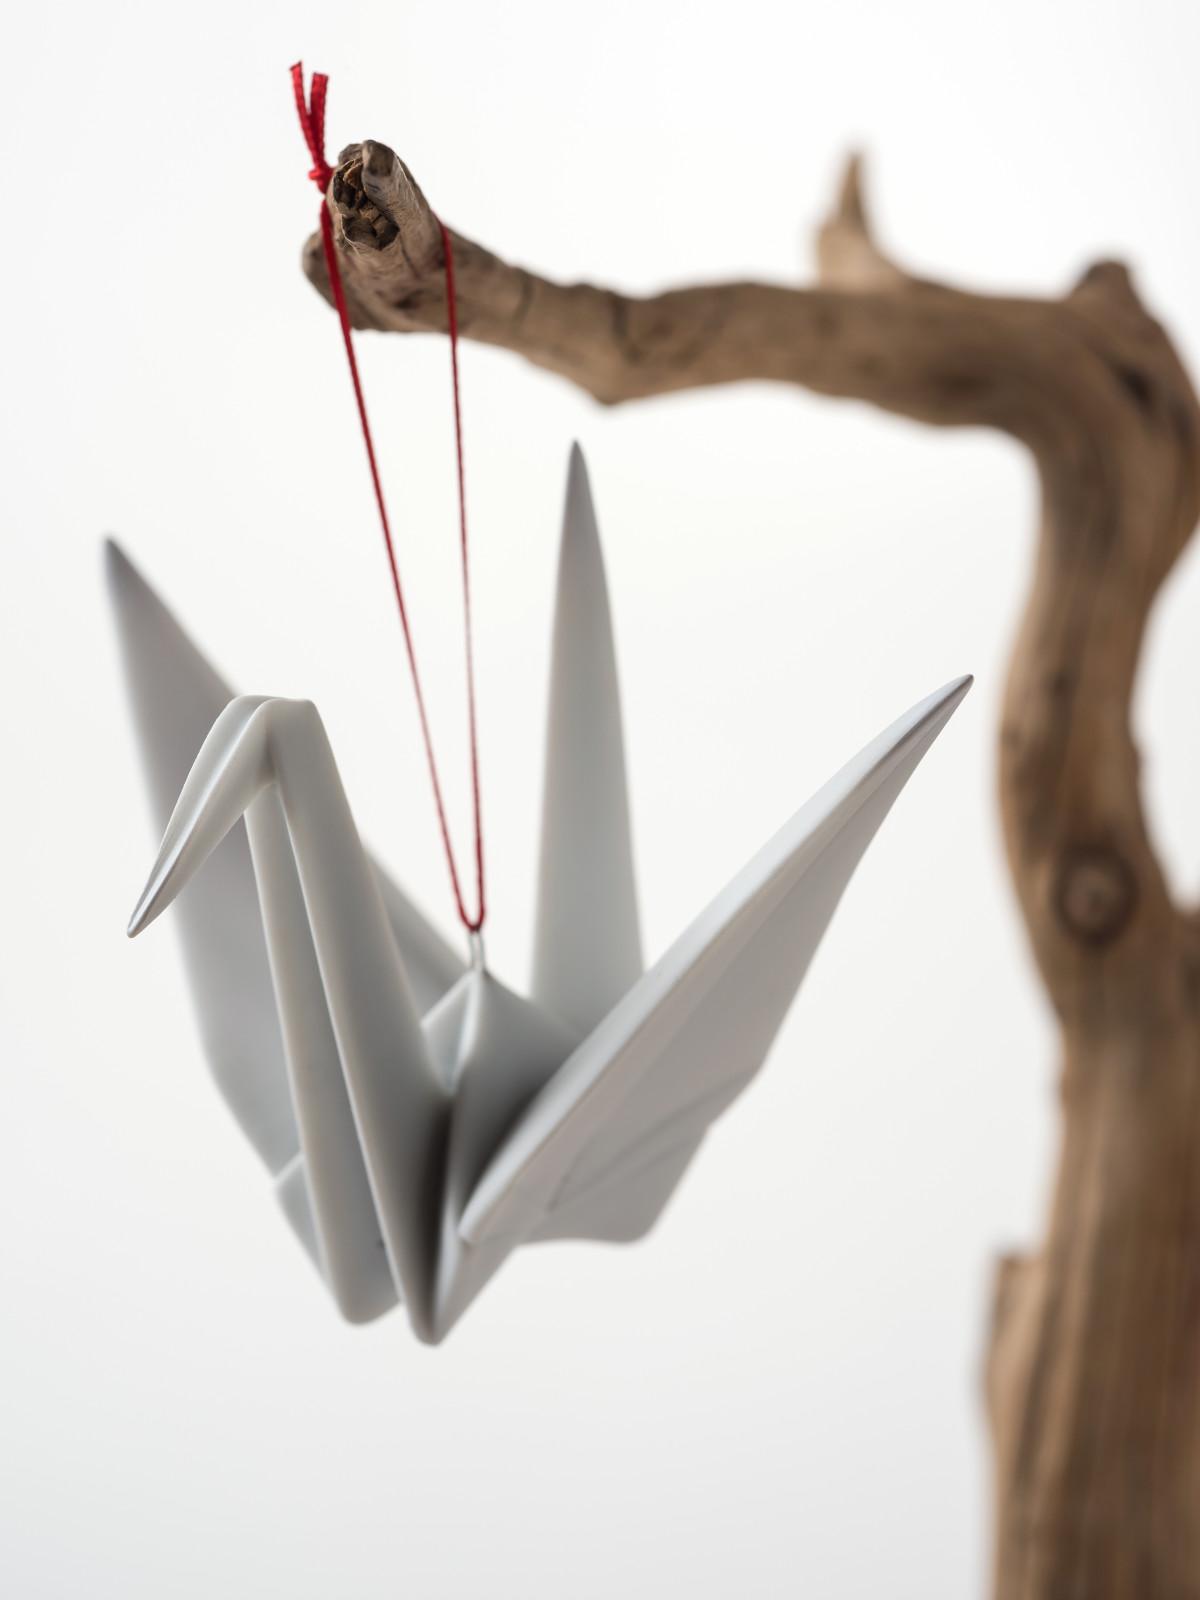 Porcelain crane origami ornament at the Lotus Shop